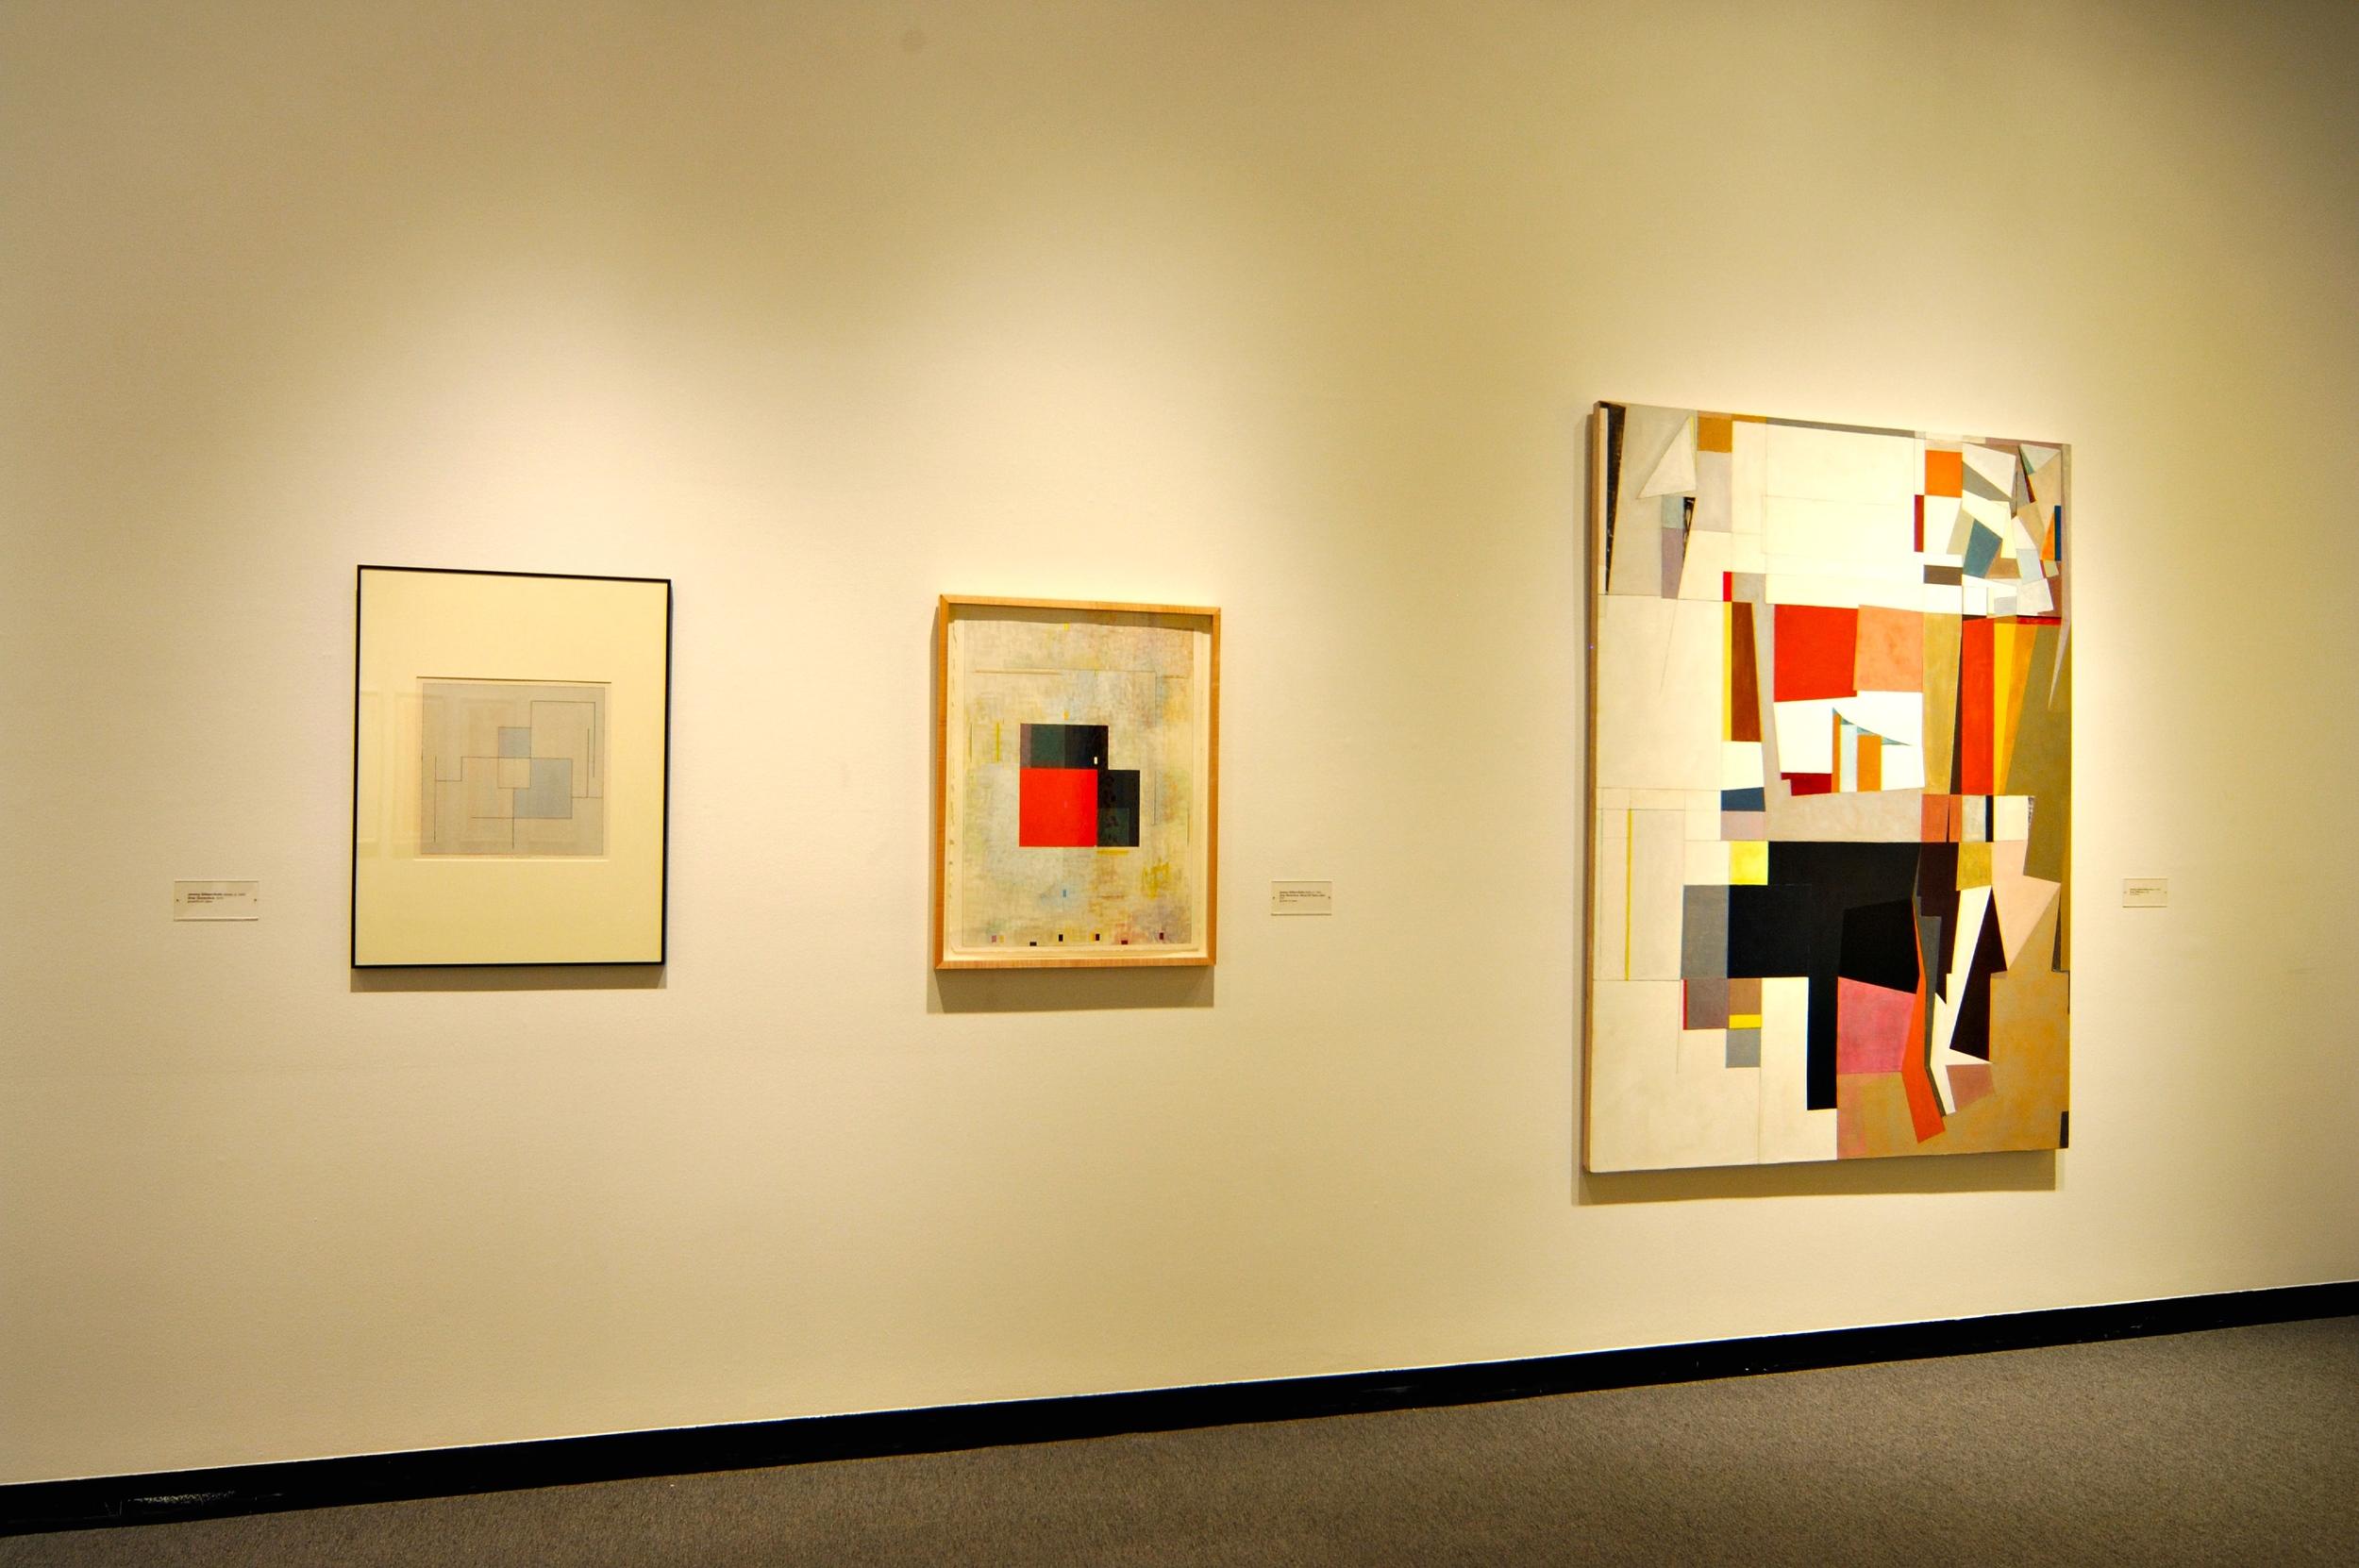 2006: Ulrich Museum of Art, Wichita, KS